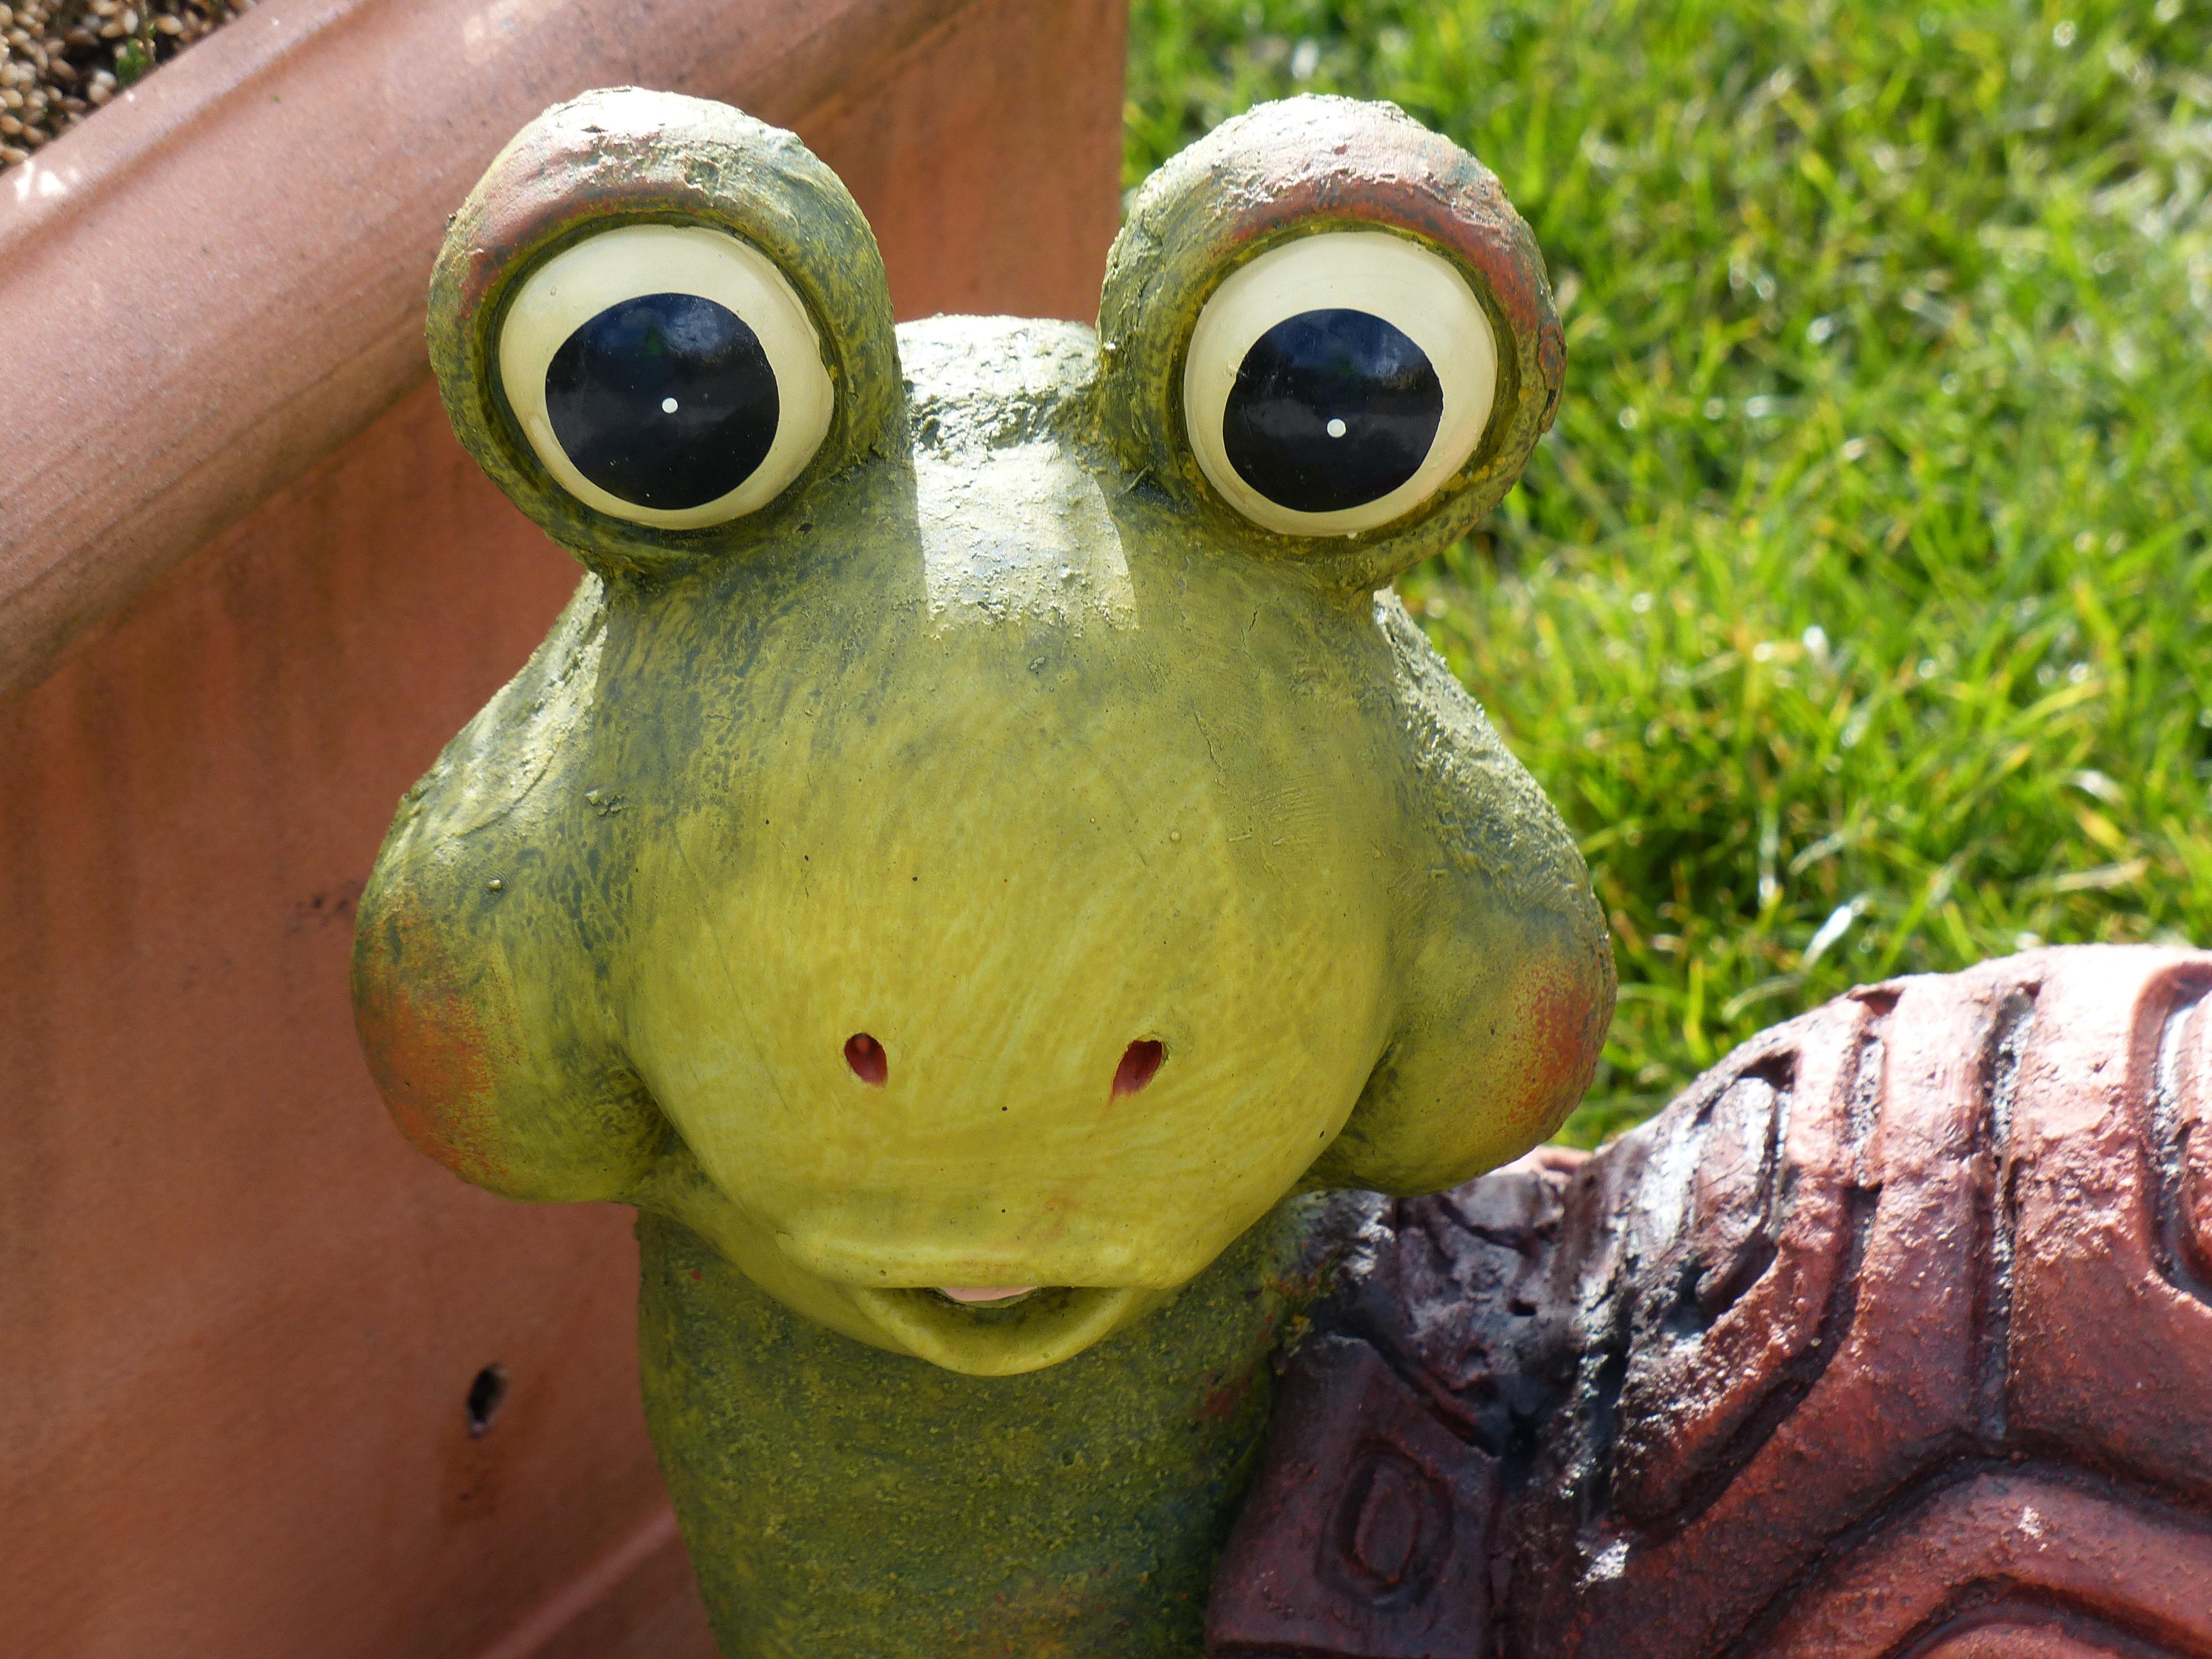 Animal Wildlife Decoration Green Ceramic Turtle Frog Amphibian Garden  Pottery Toy Fauna Close Up Eyes Figure